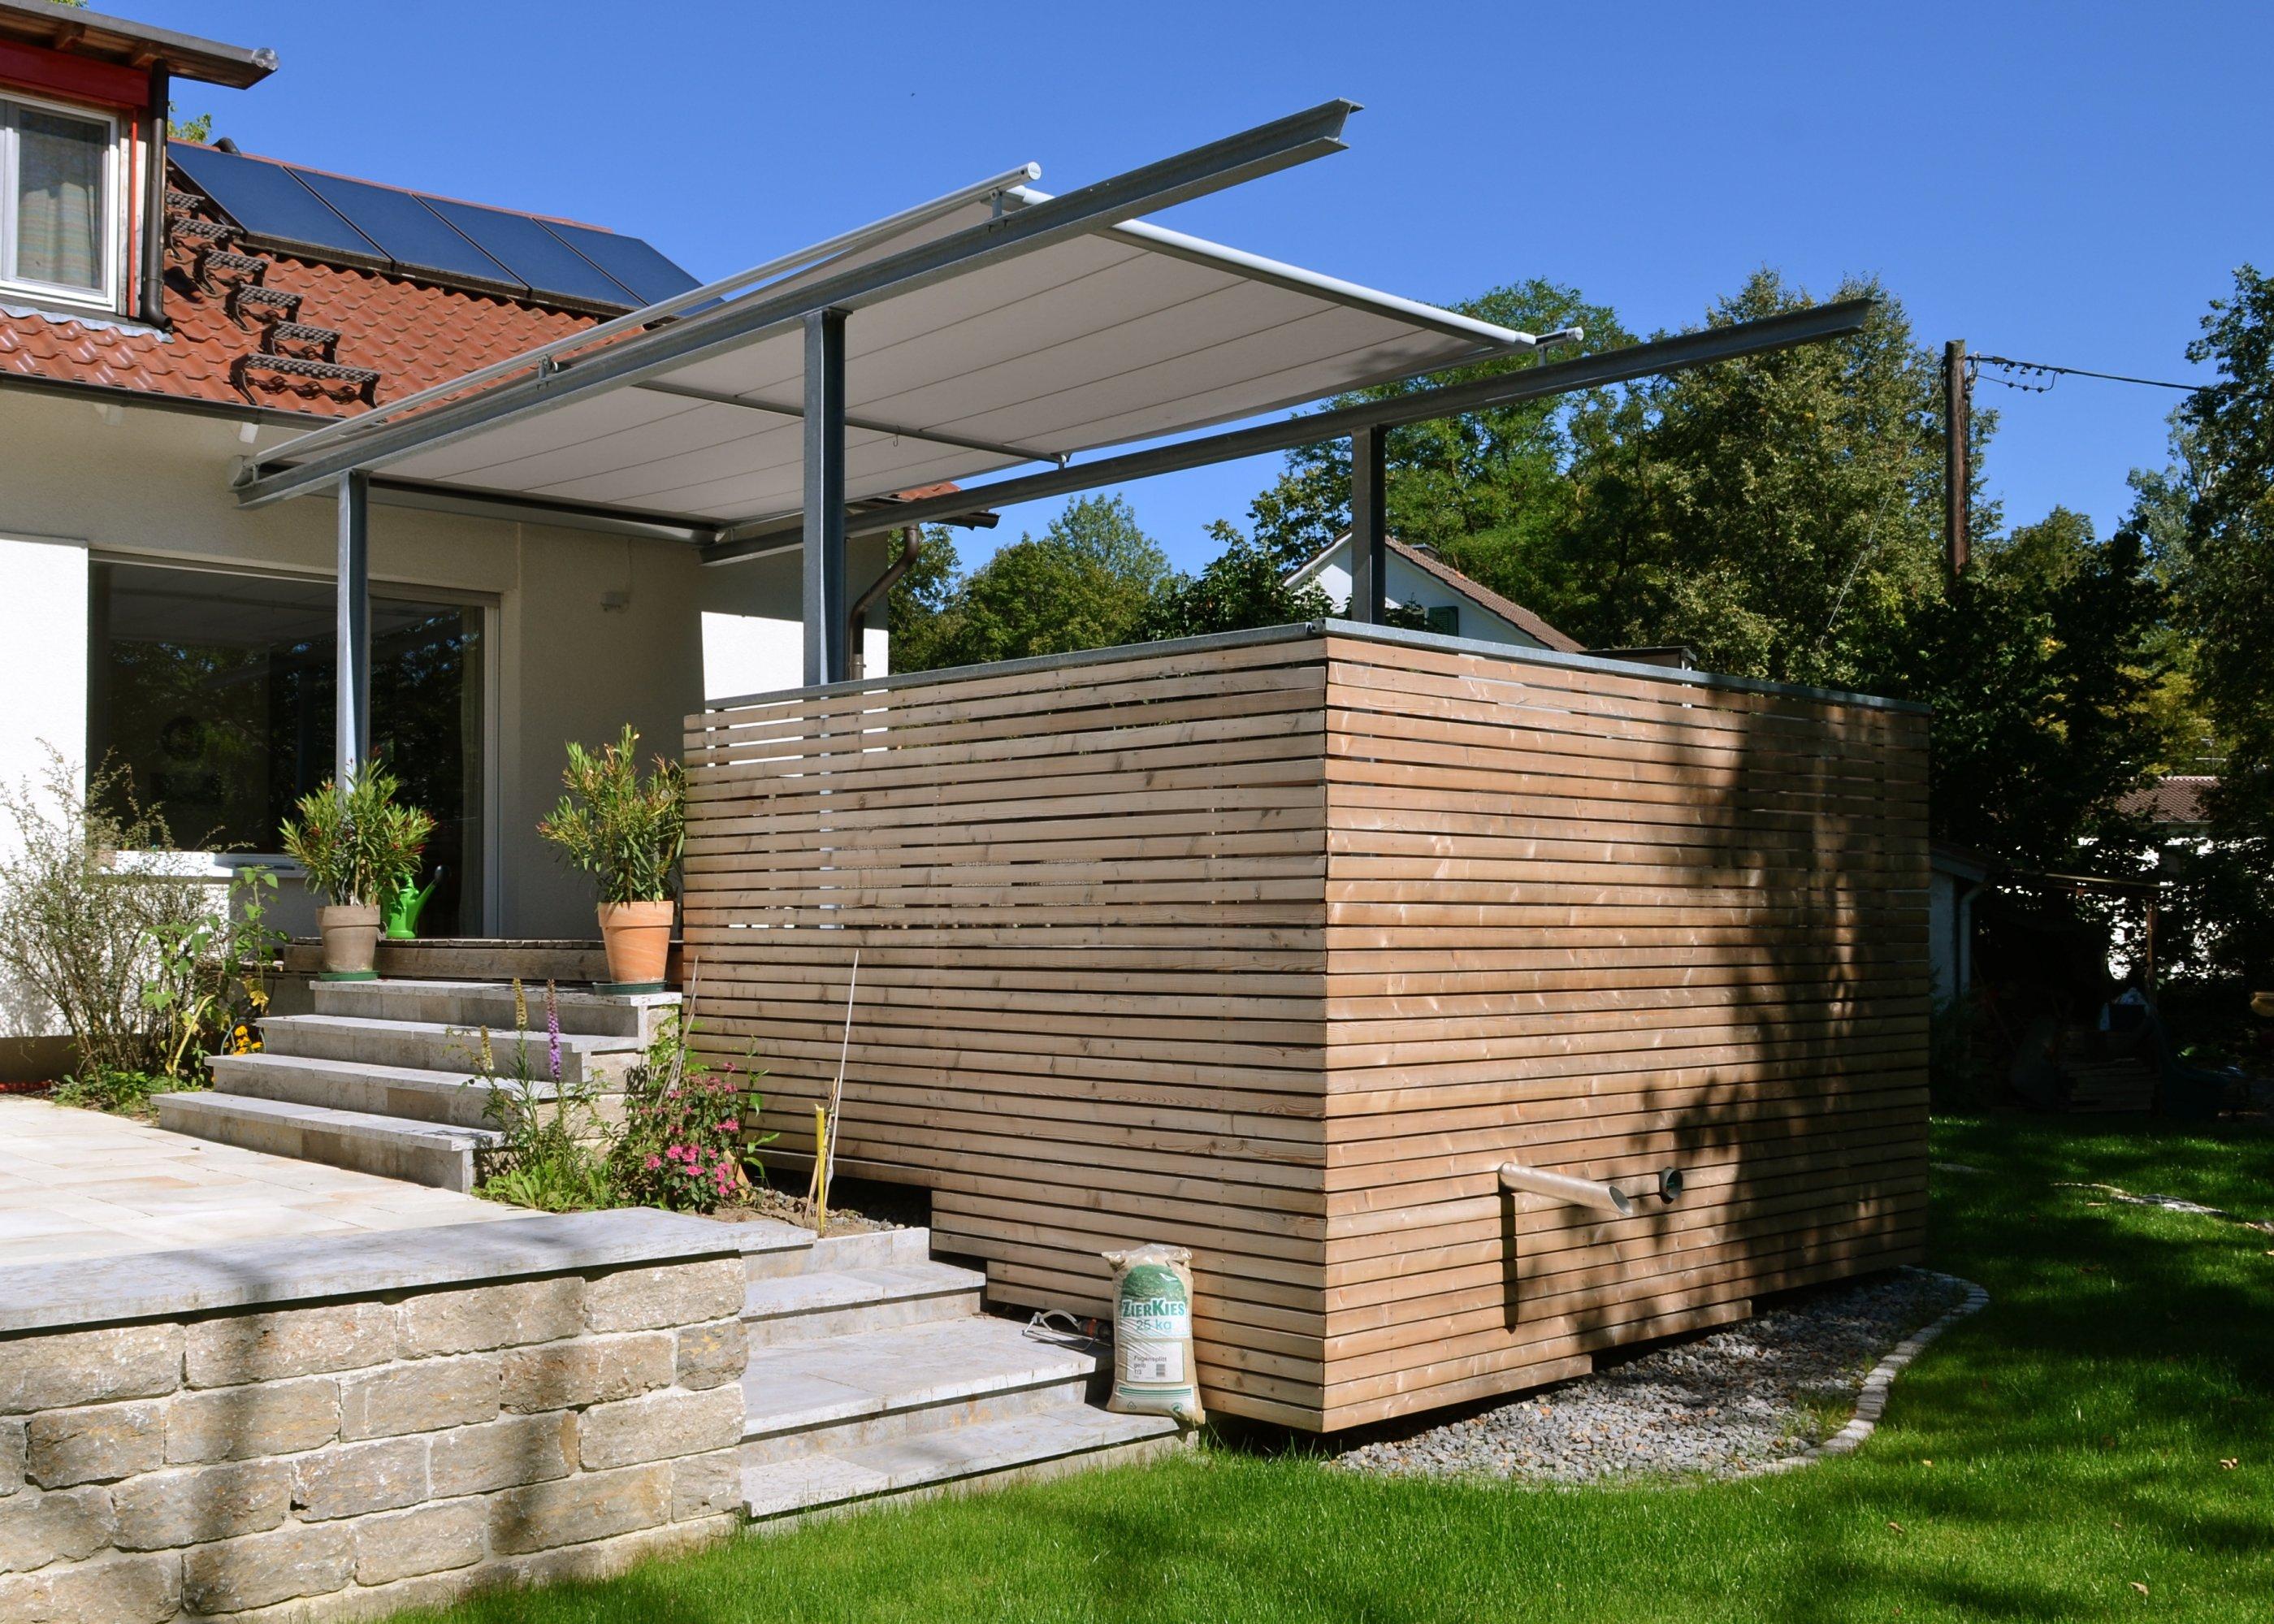 terrassen berdachung mit markise stahlbau n gele. Black Bedroom Furniture Sets. Home Design Ideas